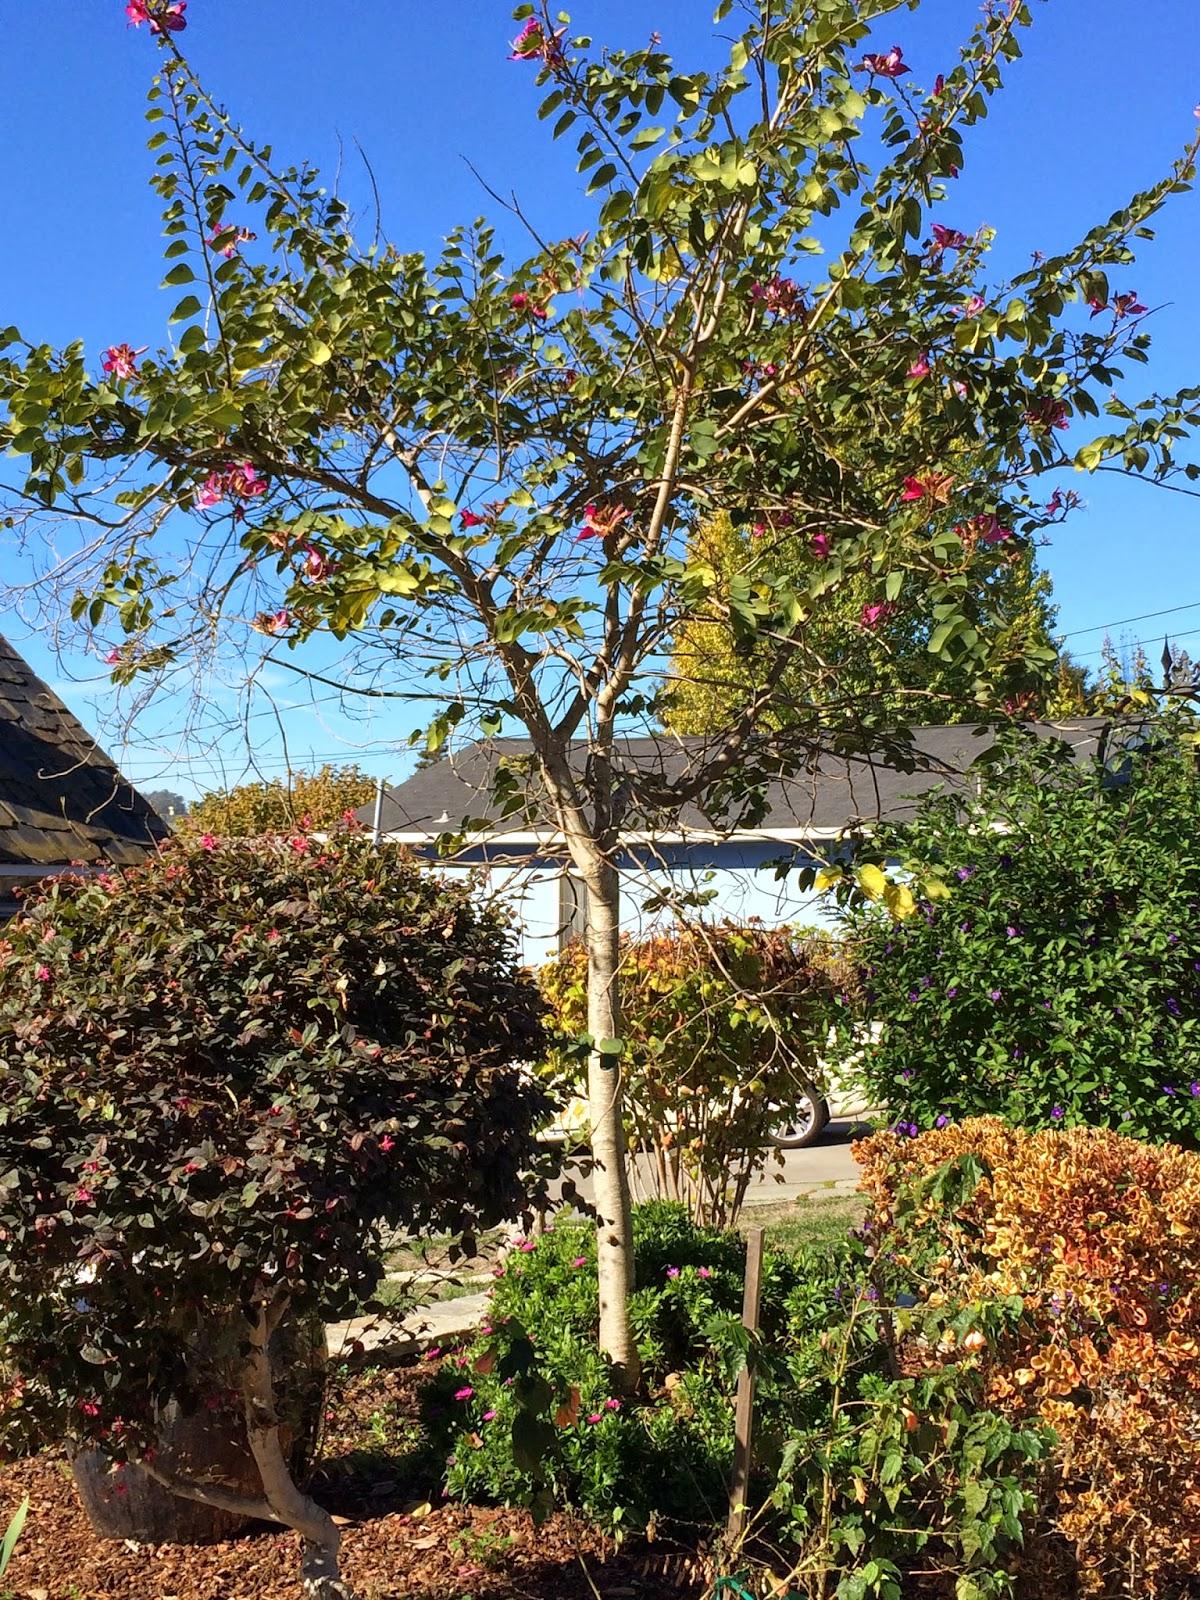 trees of santa cruz county december 2014